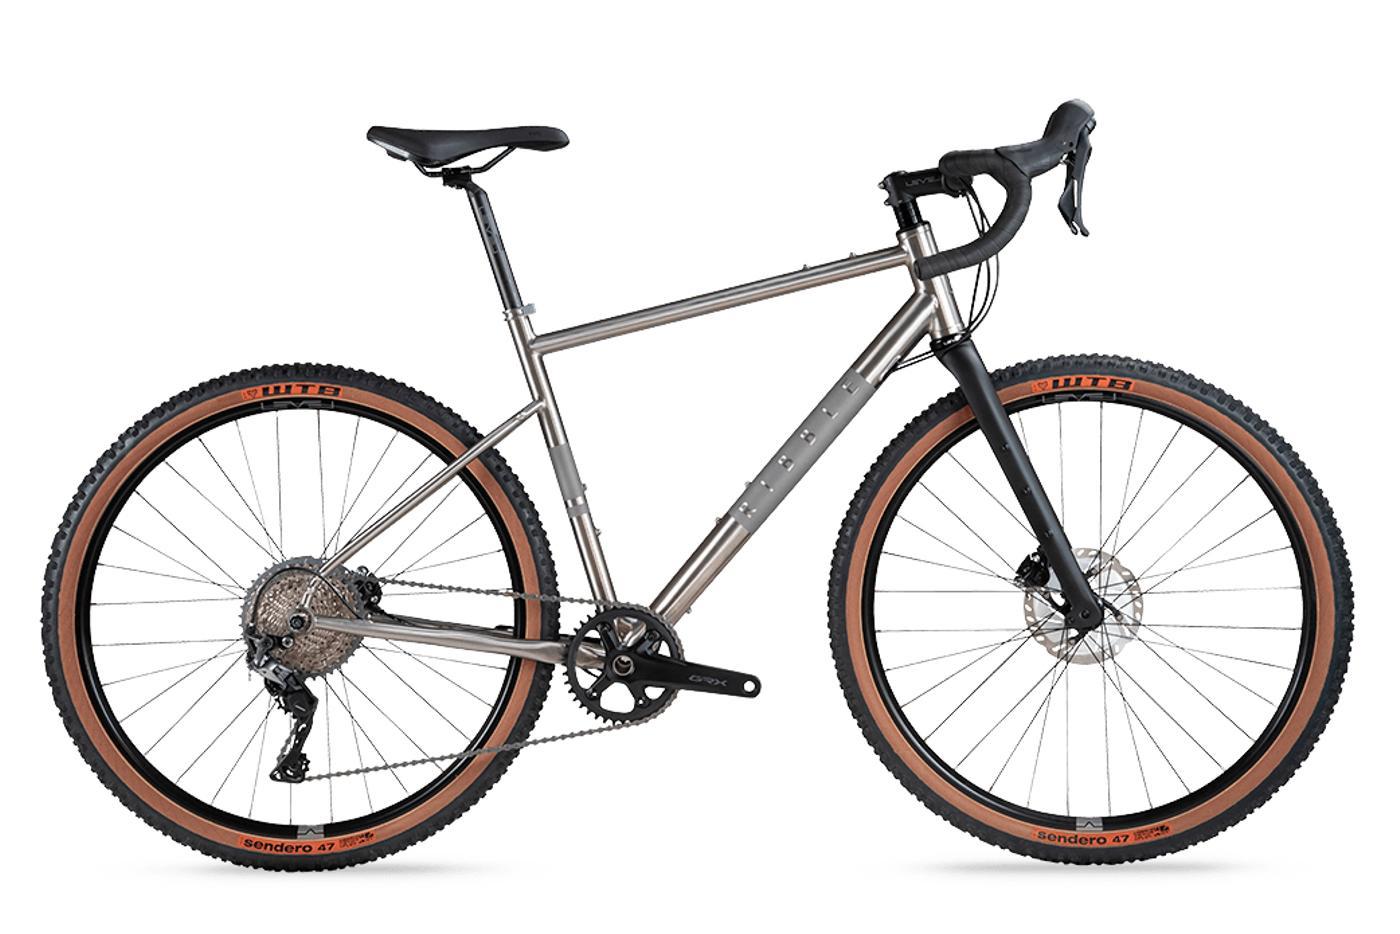 UK Brand Ribble Launches Gravel Bike Line Including Titanium Model